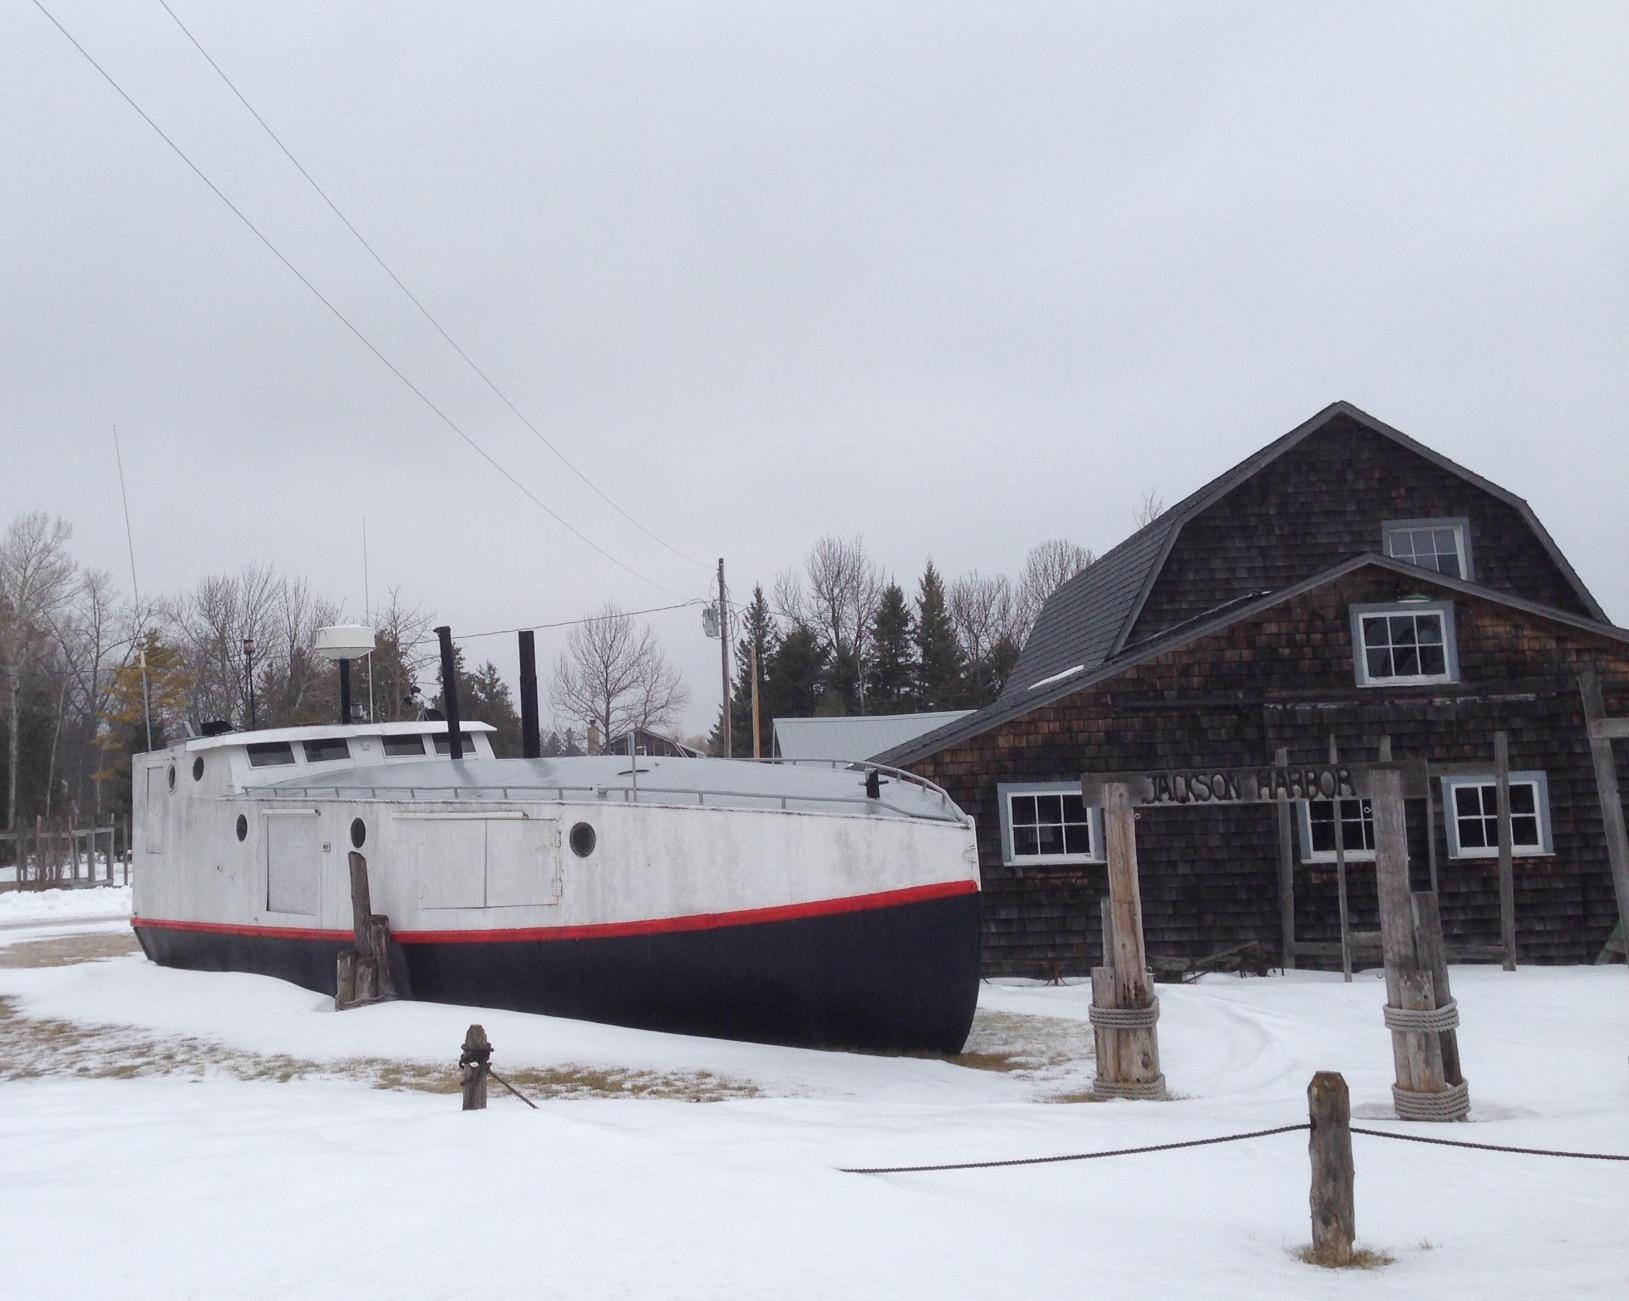 Jackson Harbor Maritime Museum asleep this Winter. Photo: Lew Clarke